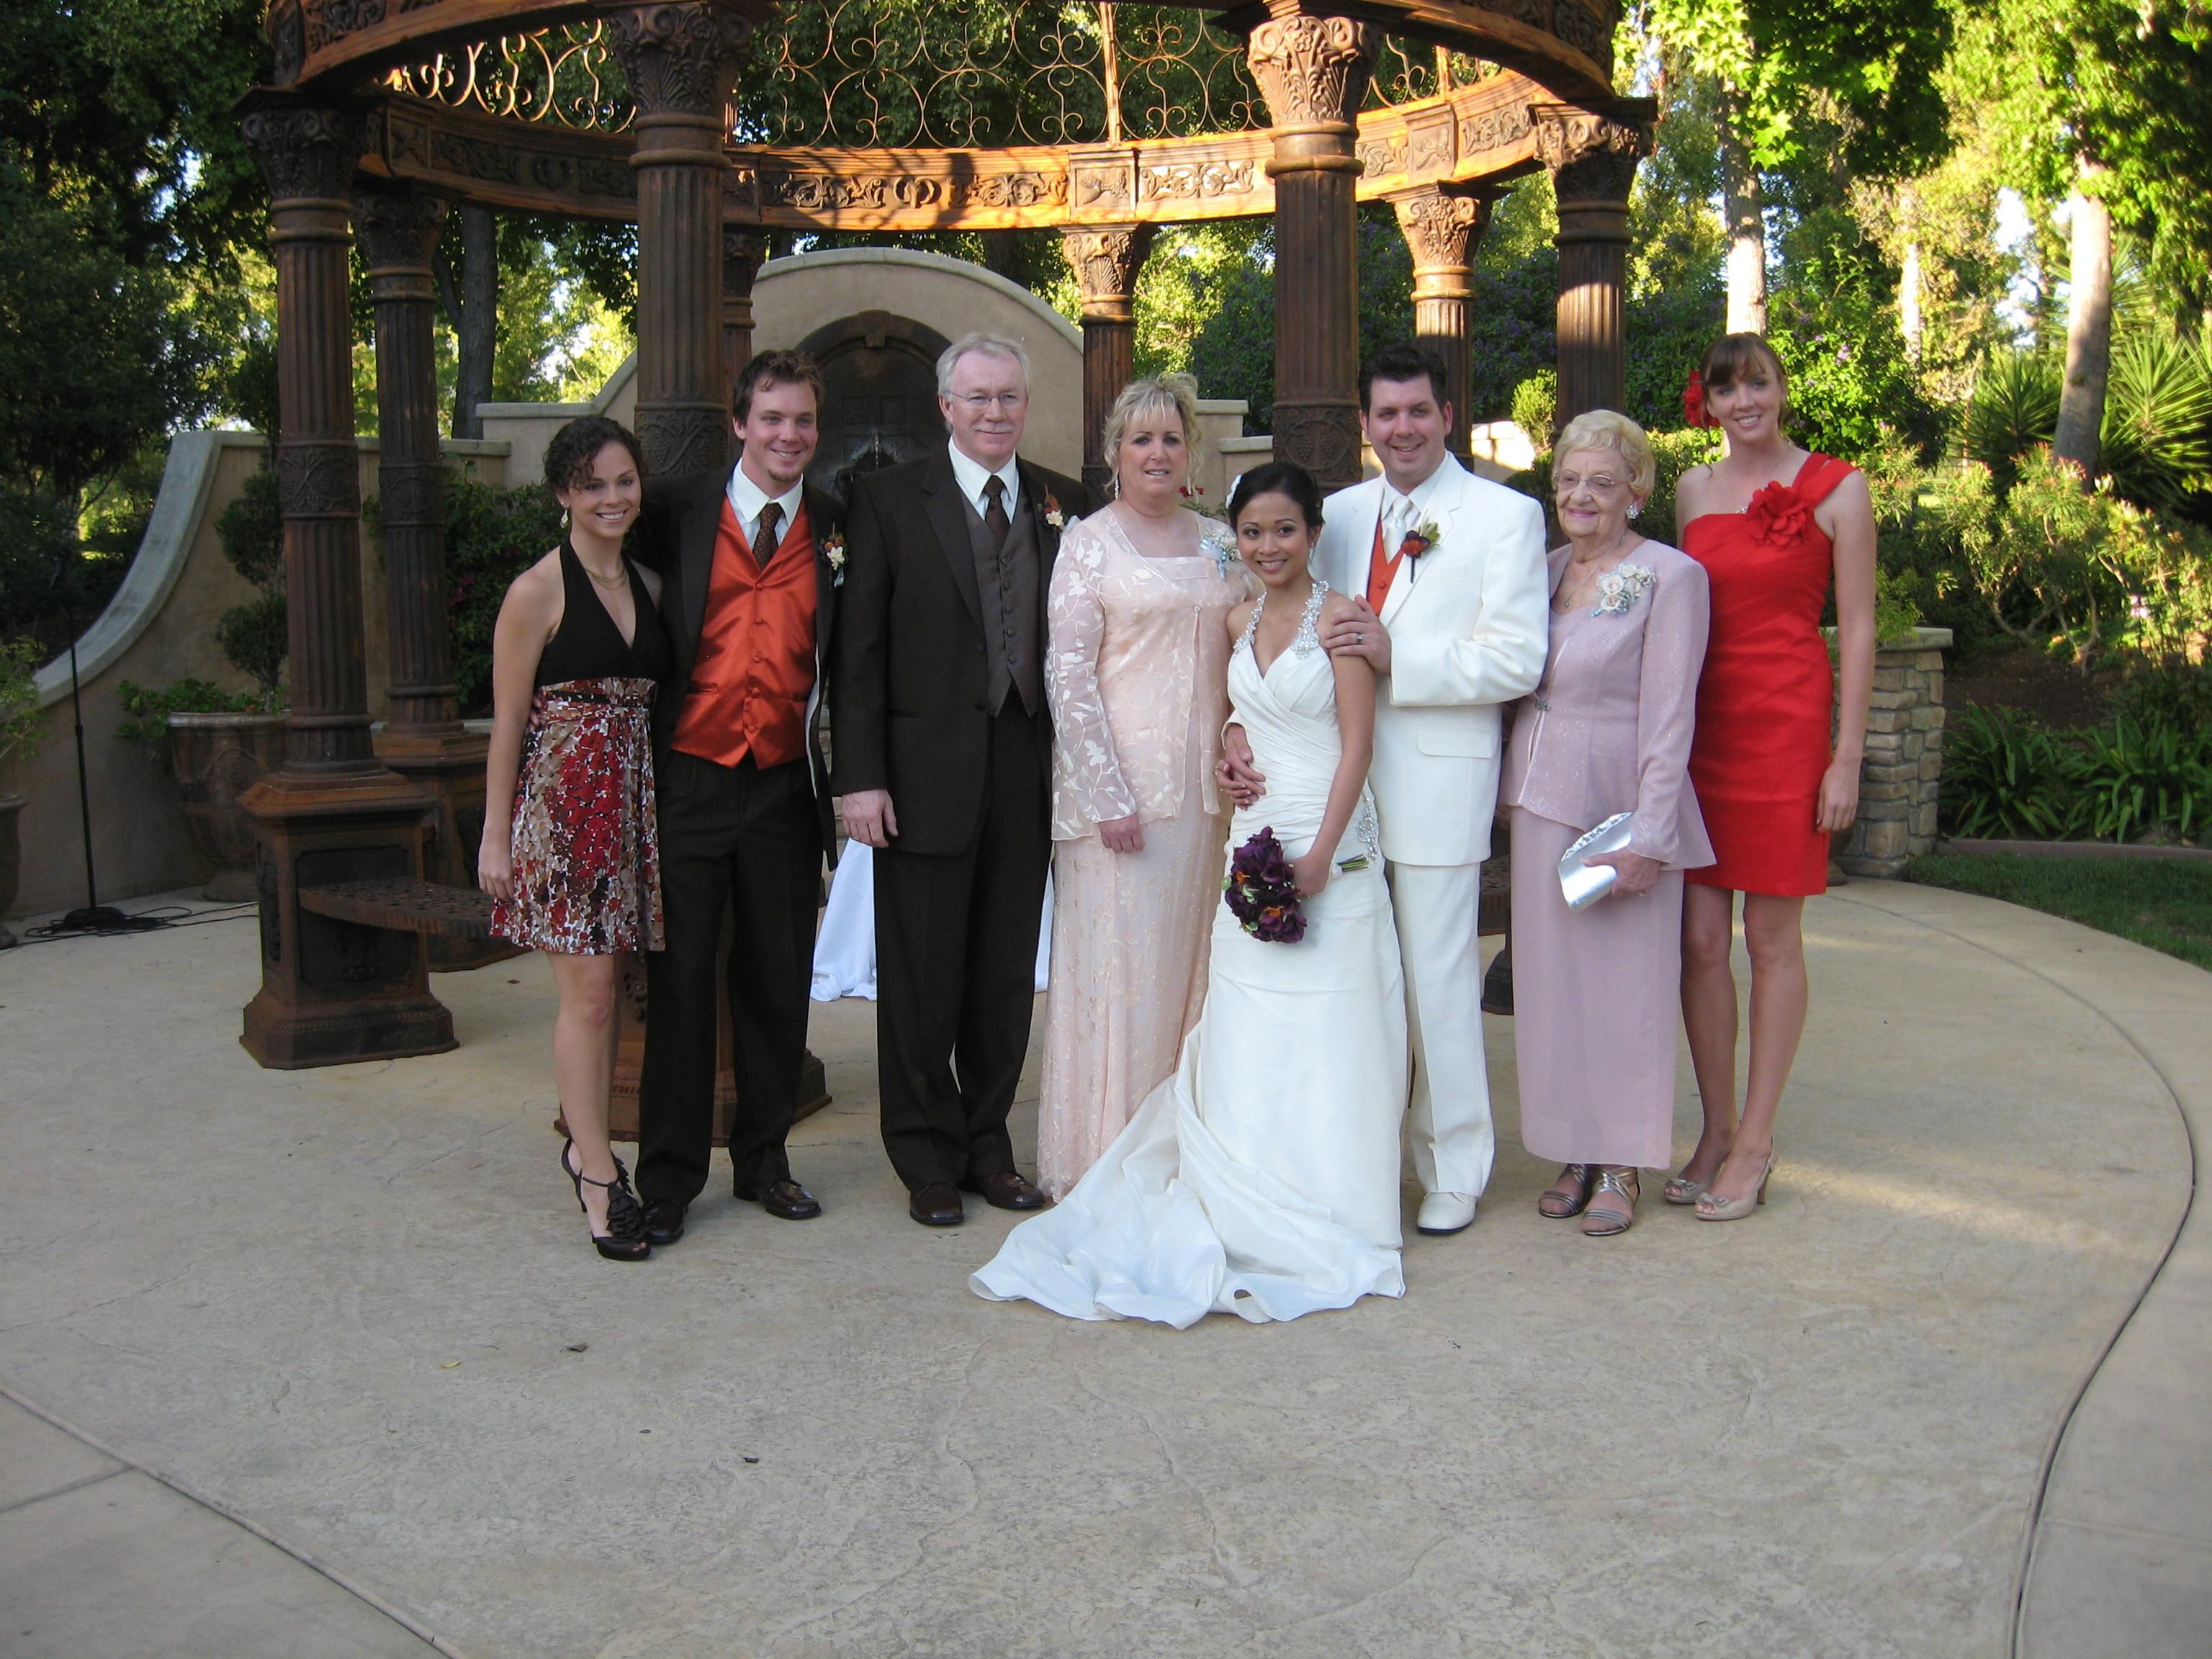 Ceremony, Reception, Flowers & Decor, Pre-ceremony